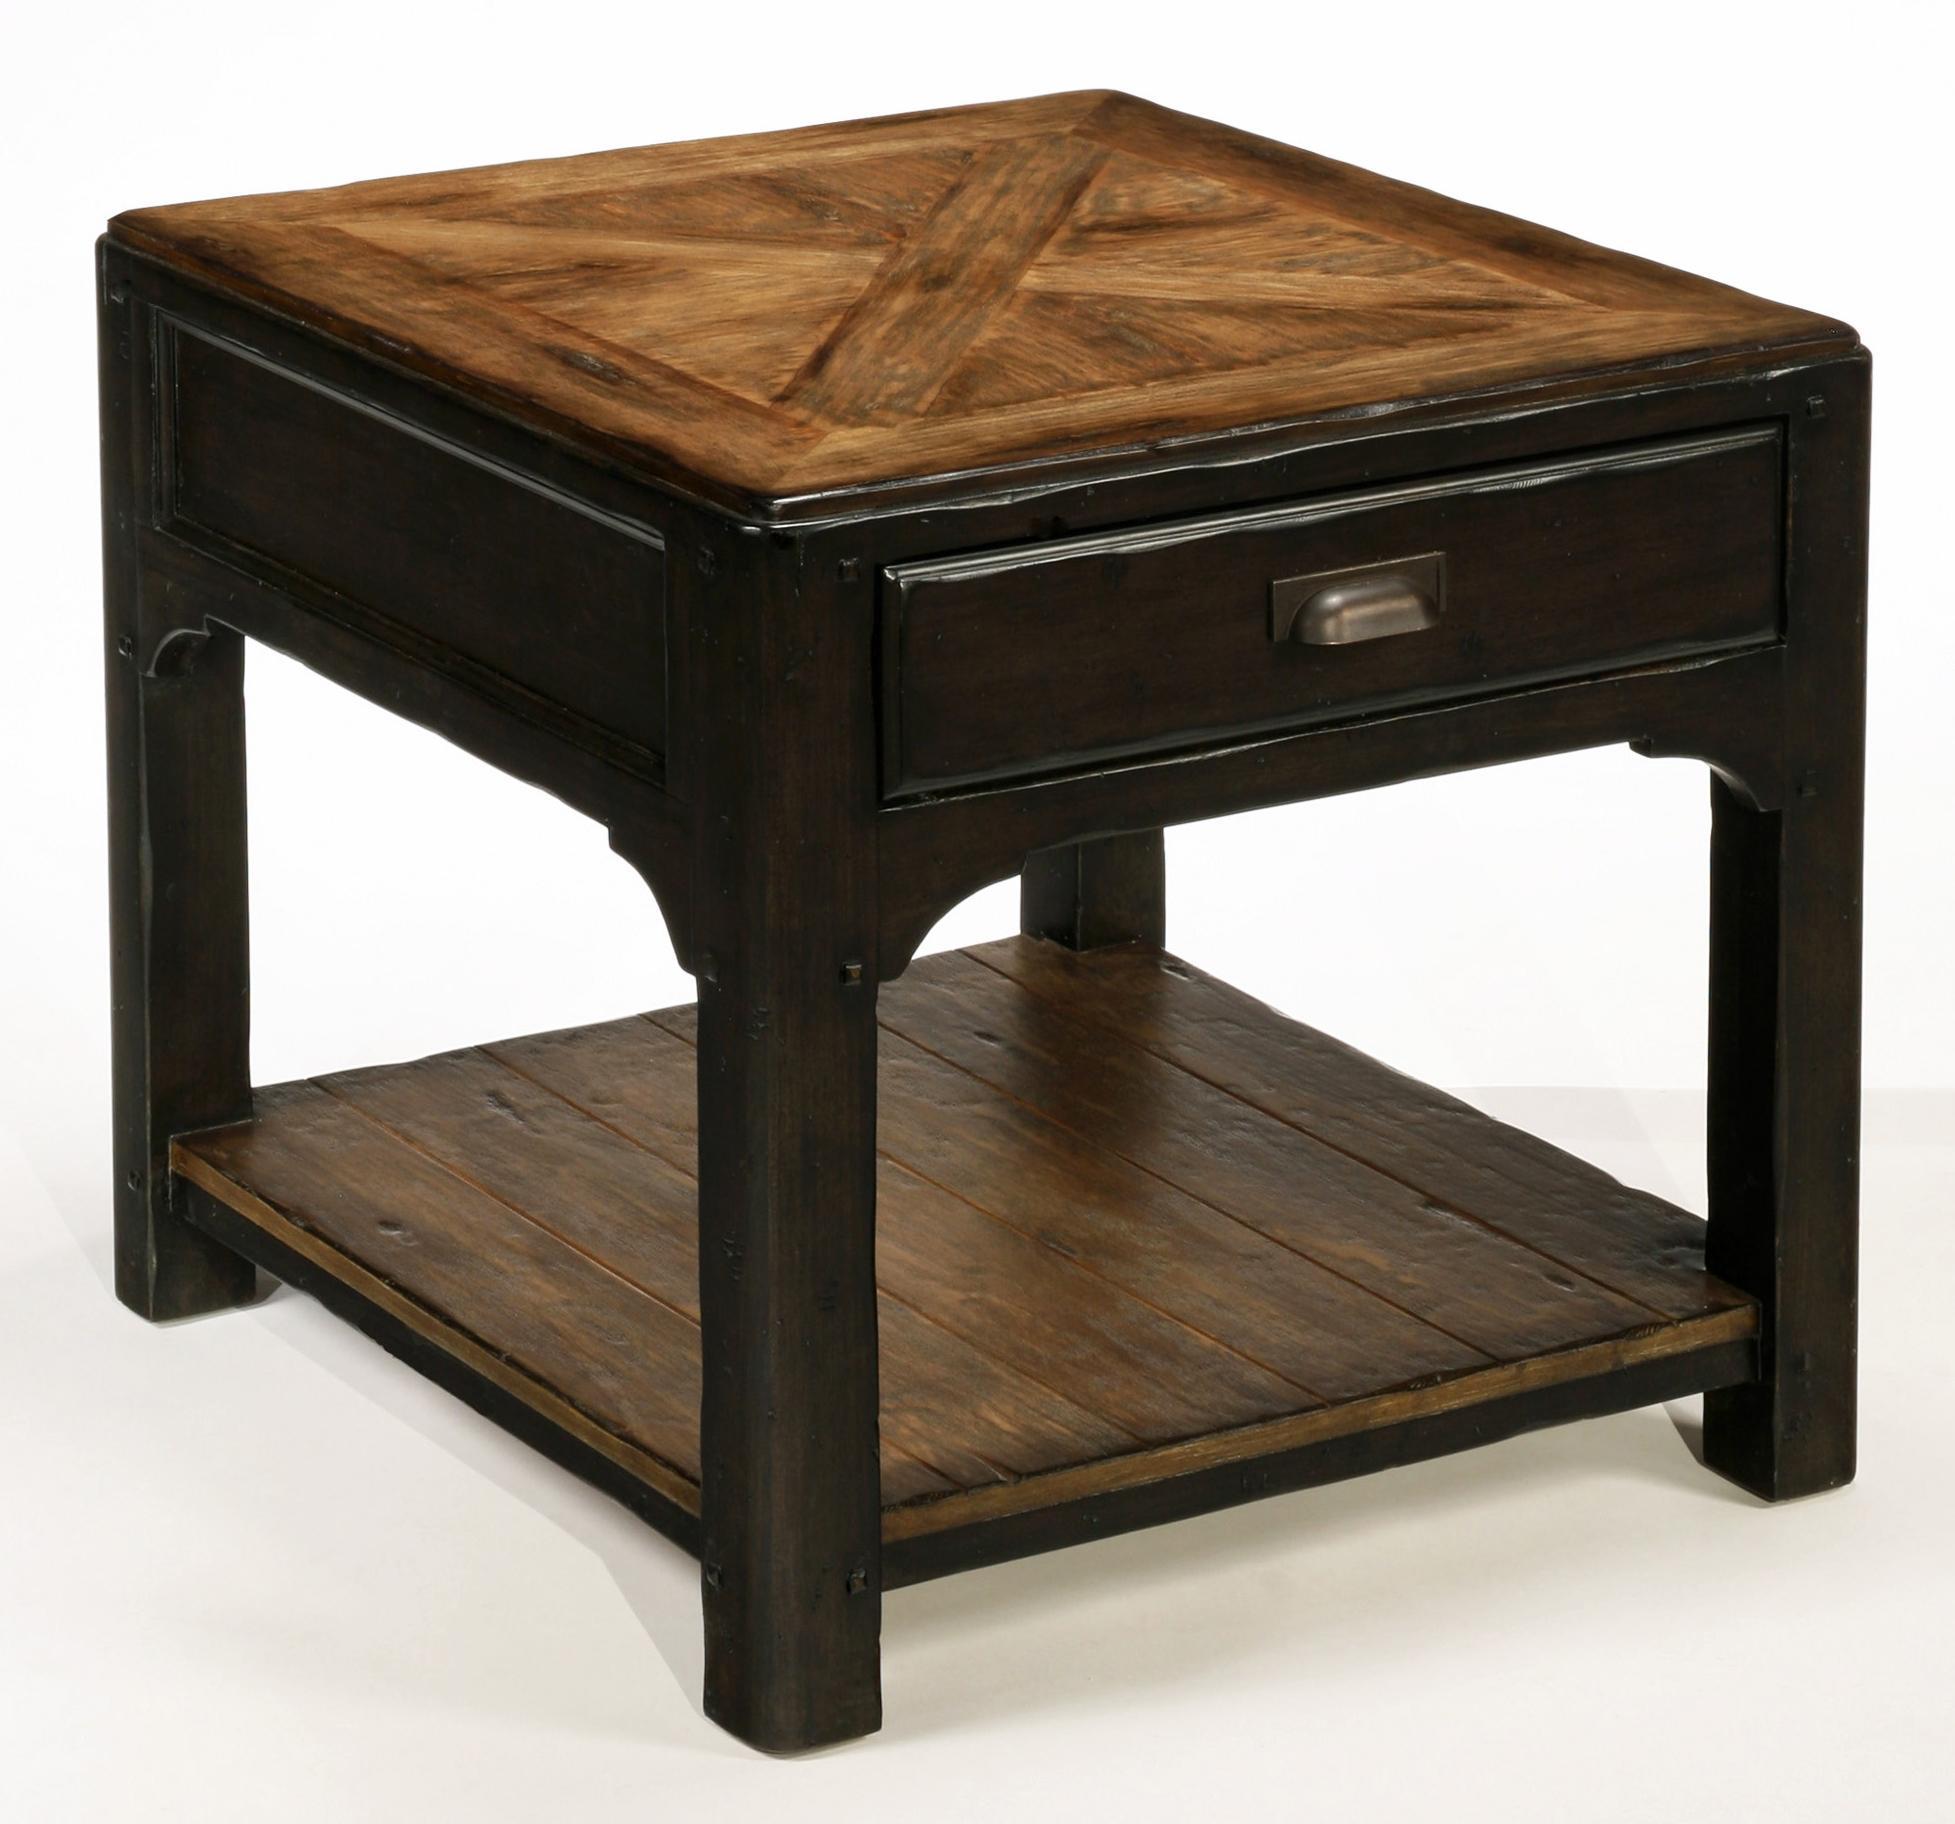 LaurelHouse Designs Carson End Table - Item Number: 104221-02